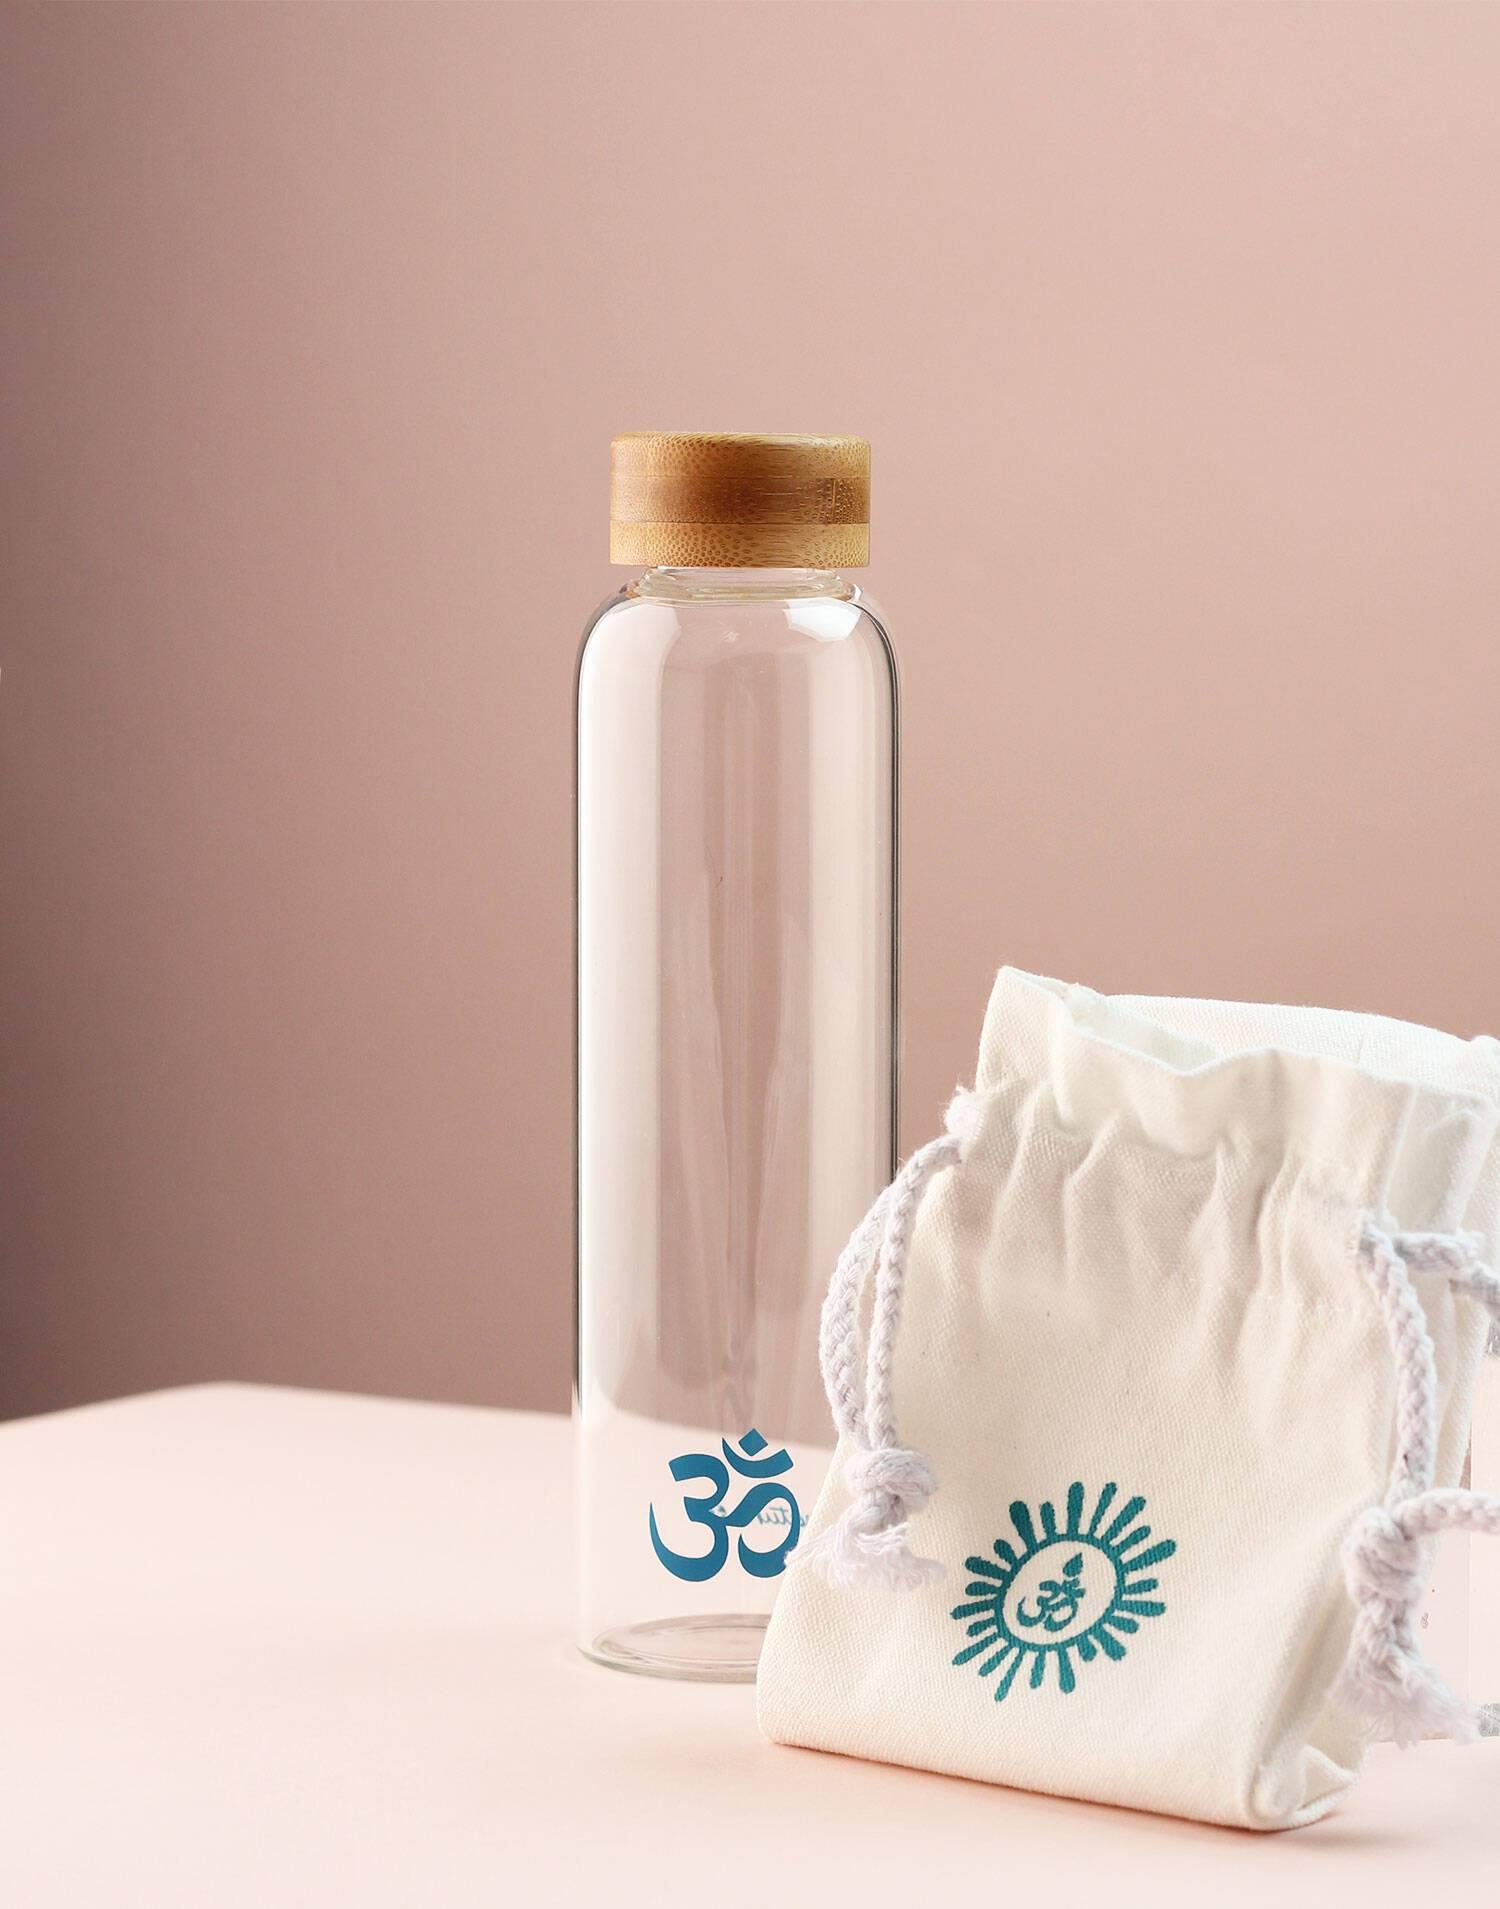 Botella con bolsa om